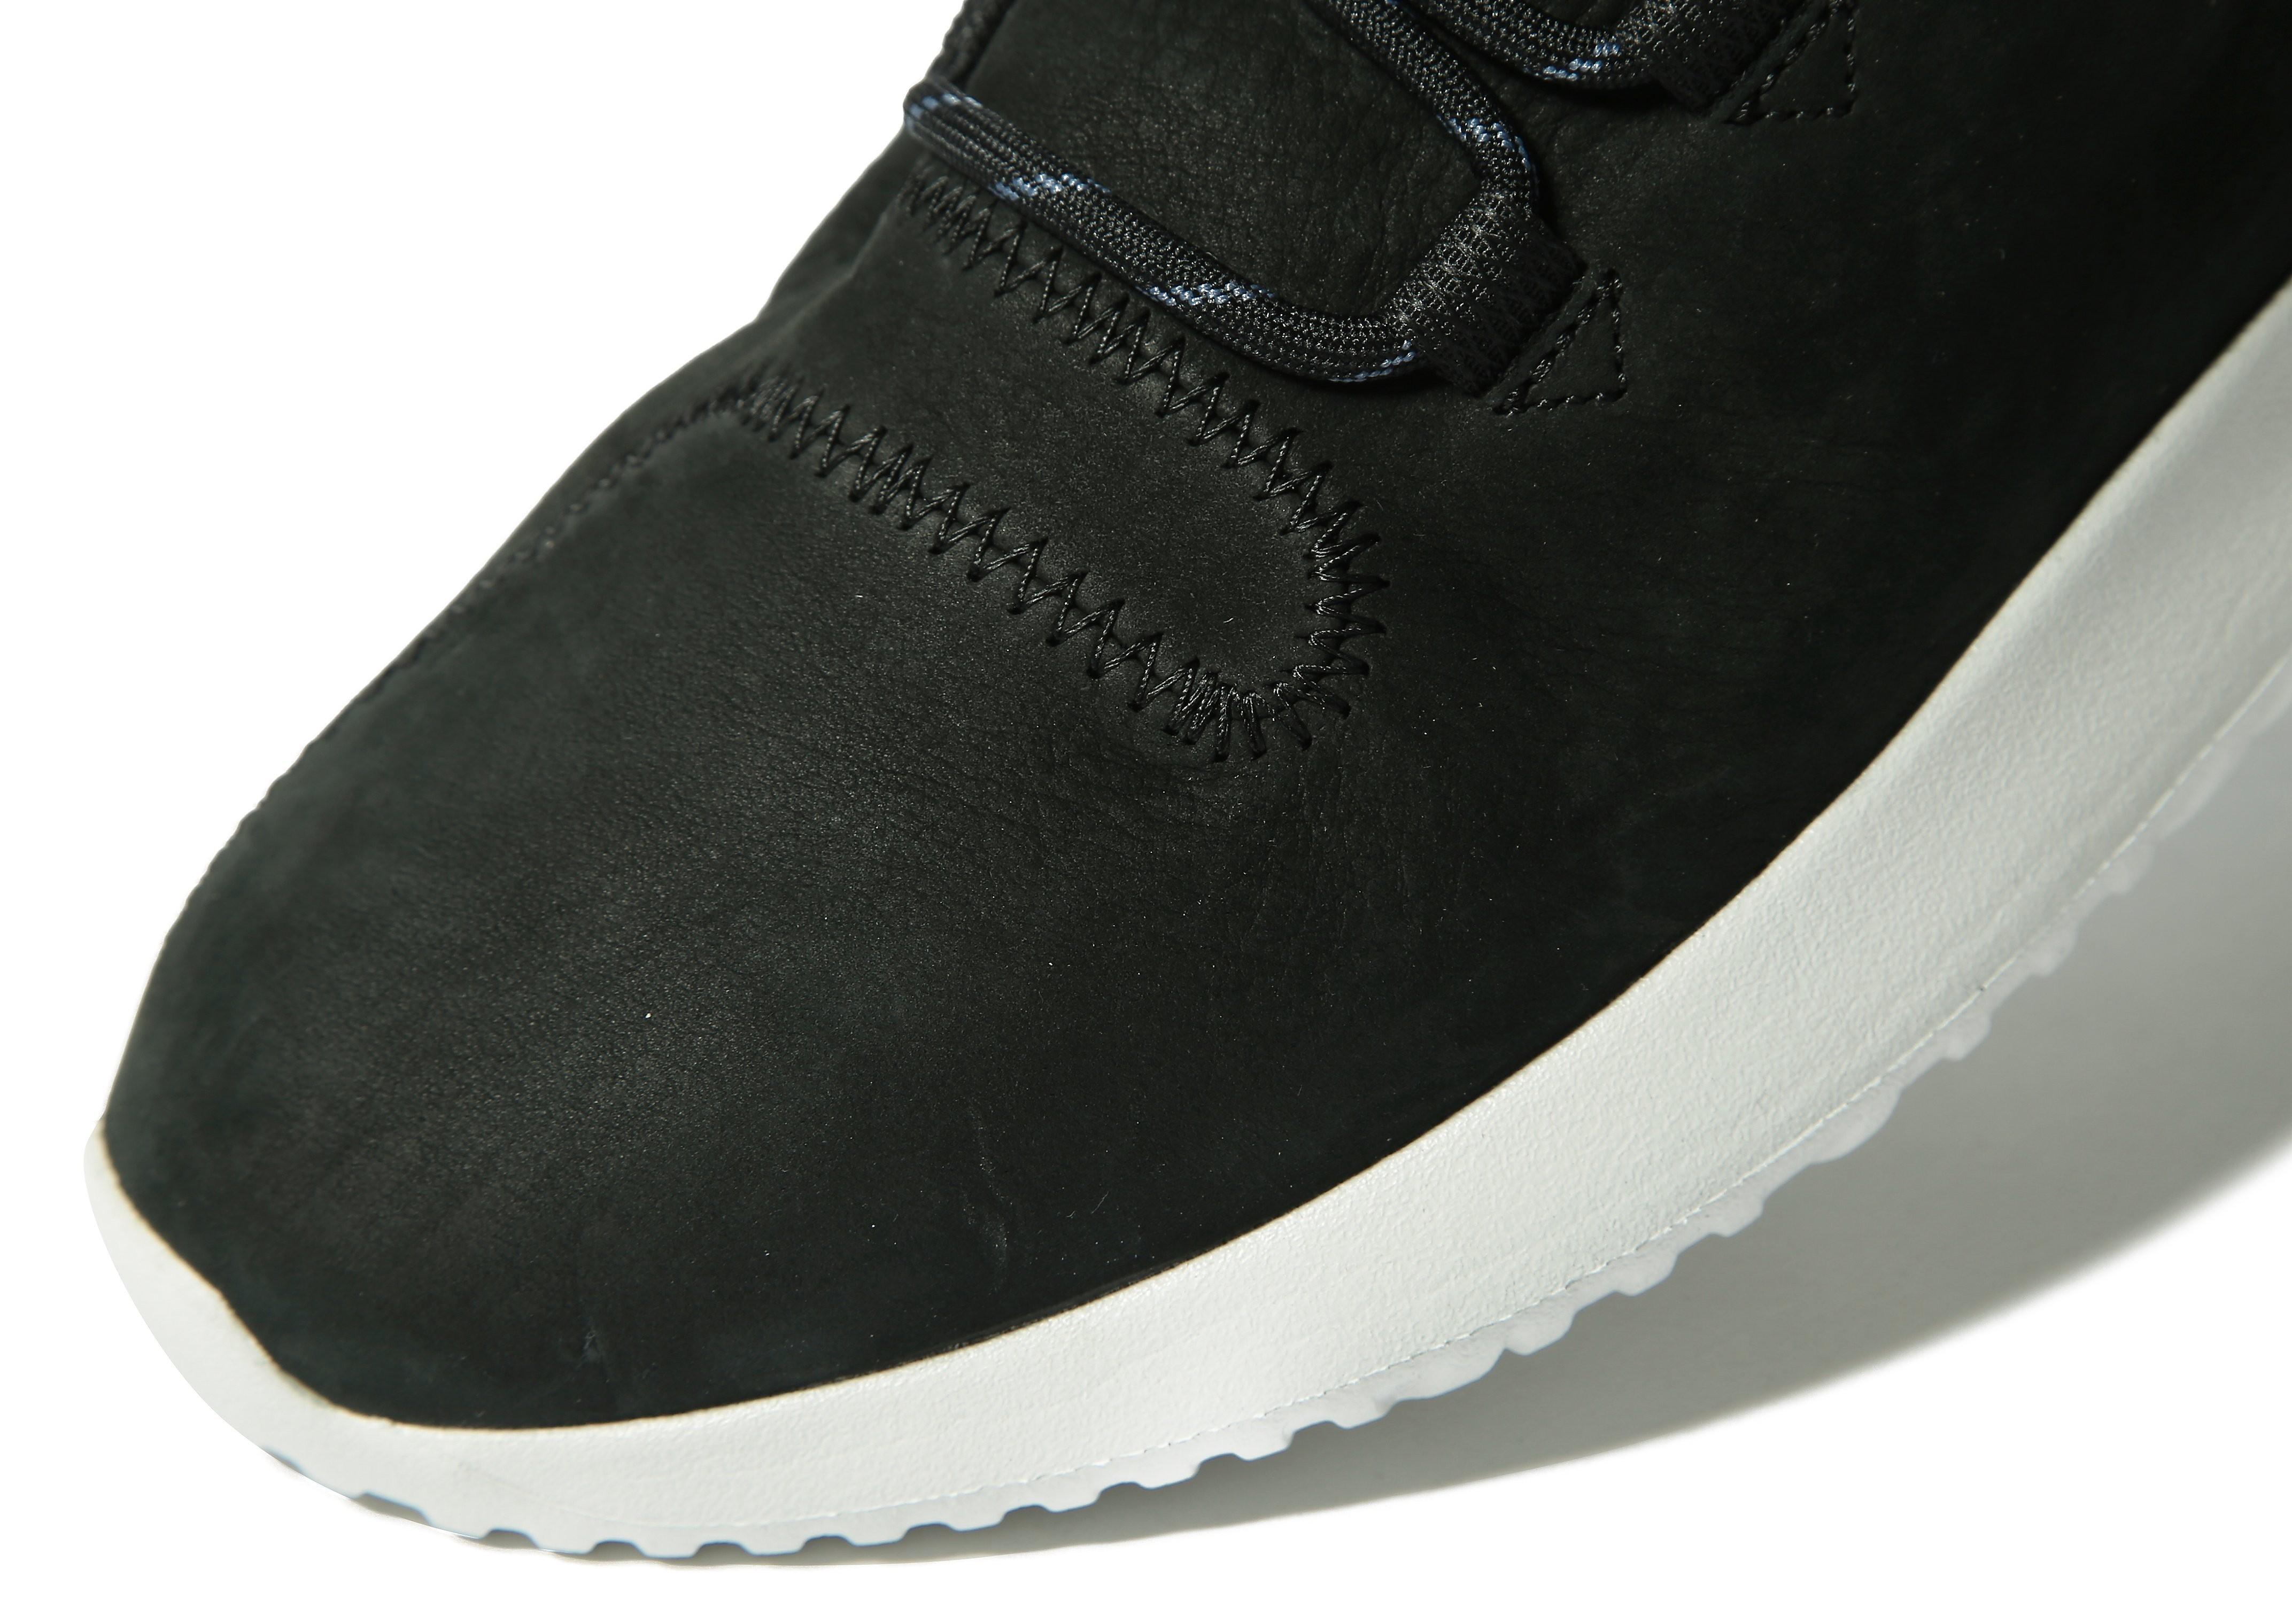 adidas Originals Tubular Shadow Leather